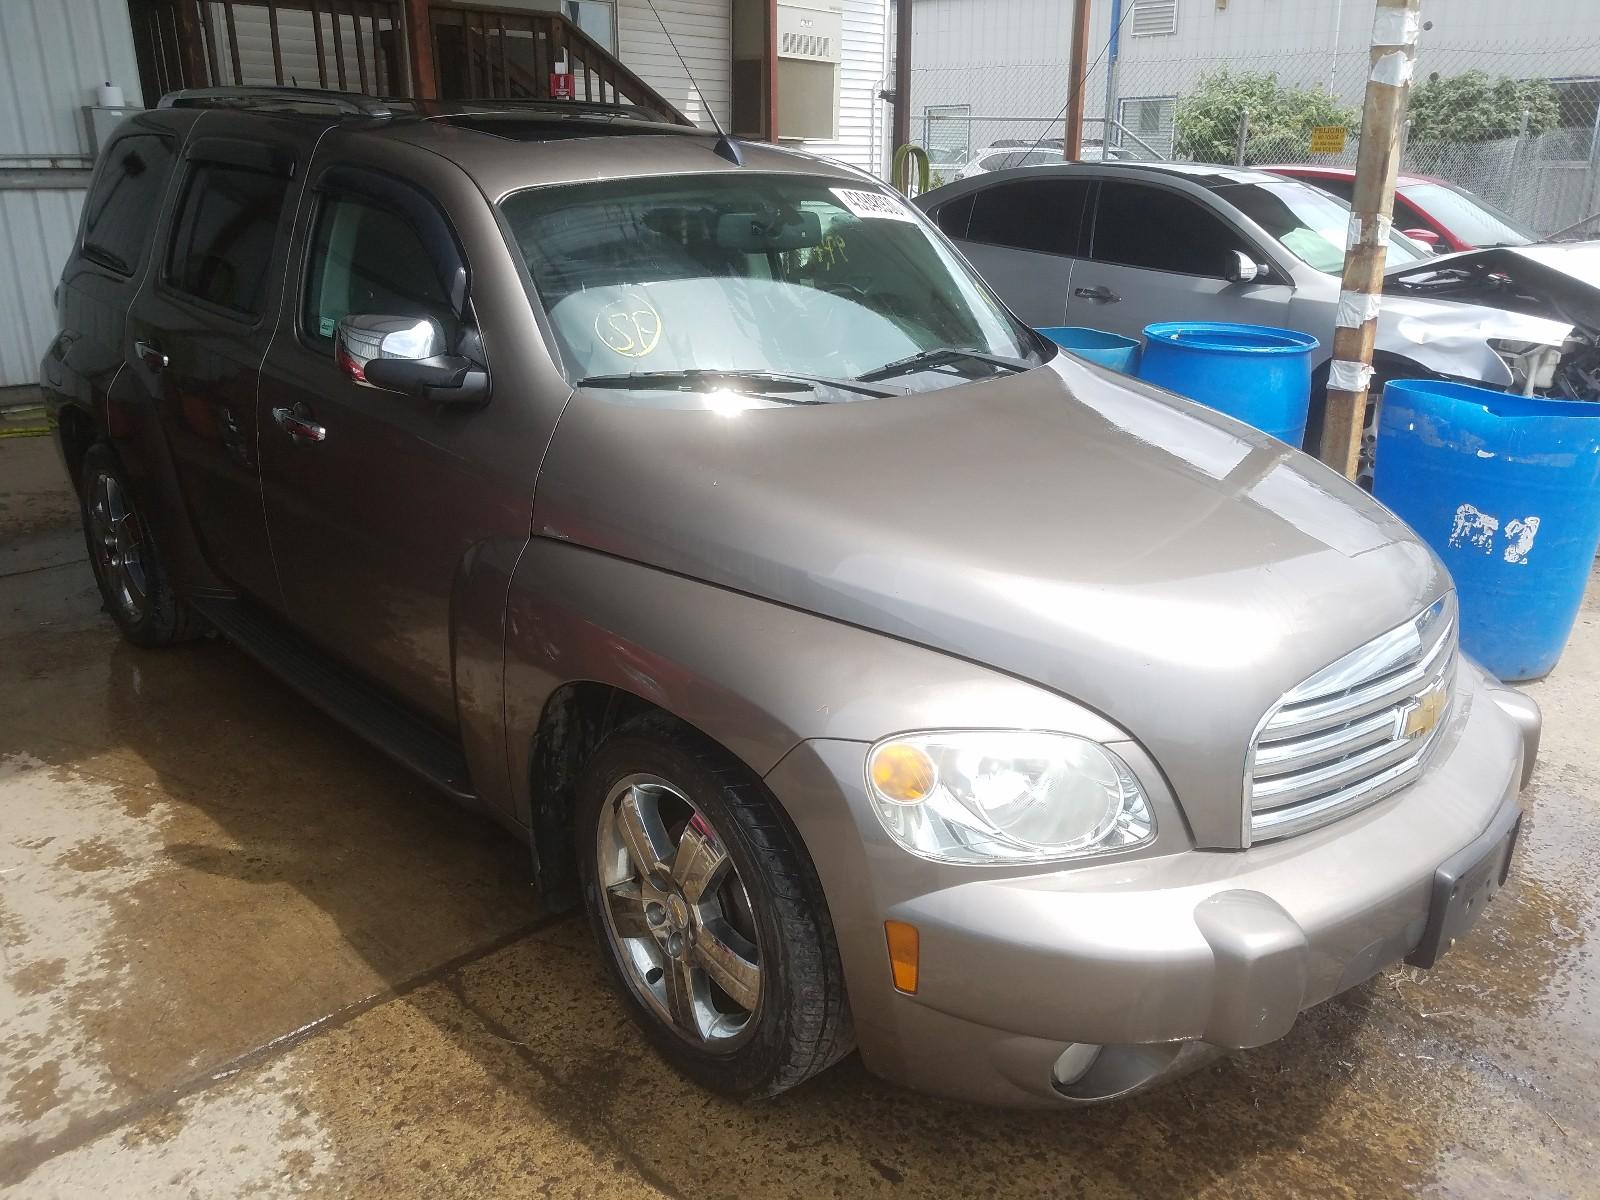 2011 Chevrolet Hhr Lt For Sale At Copart Pennsburg Pa Lot